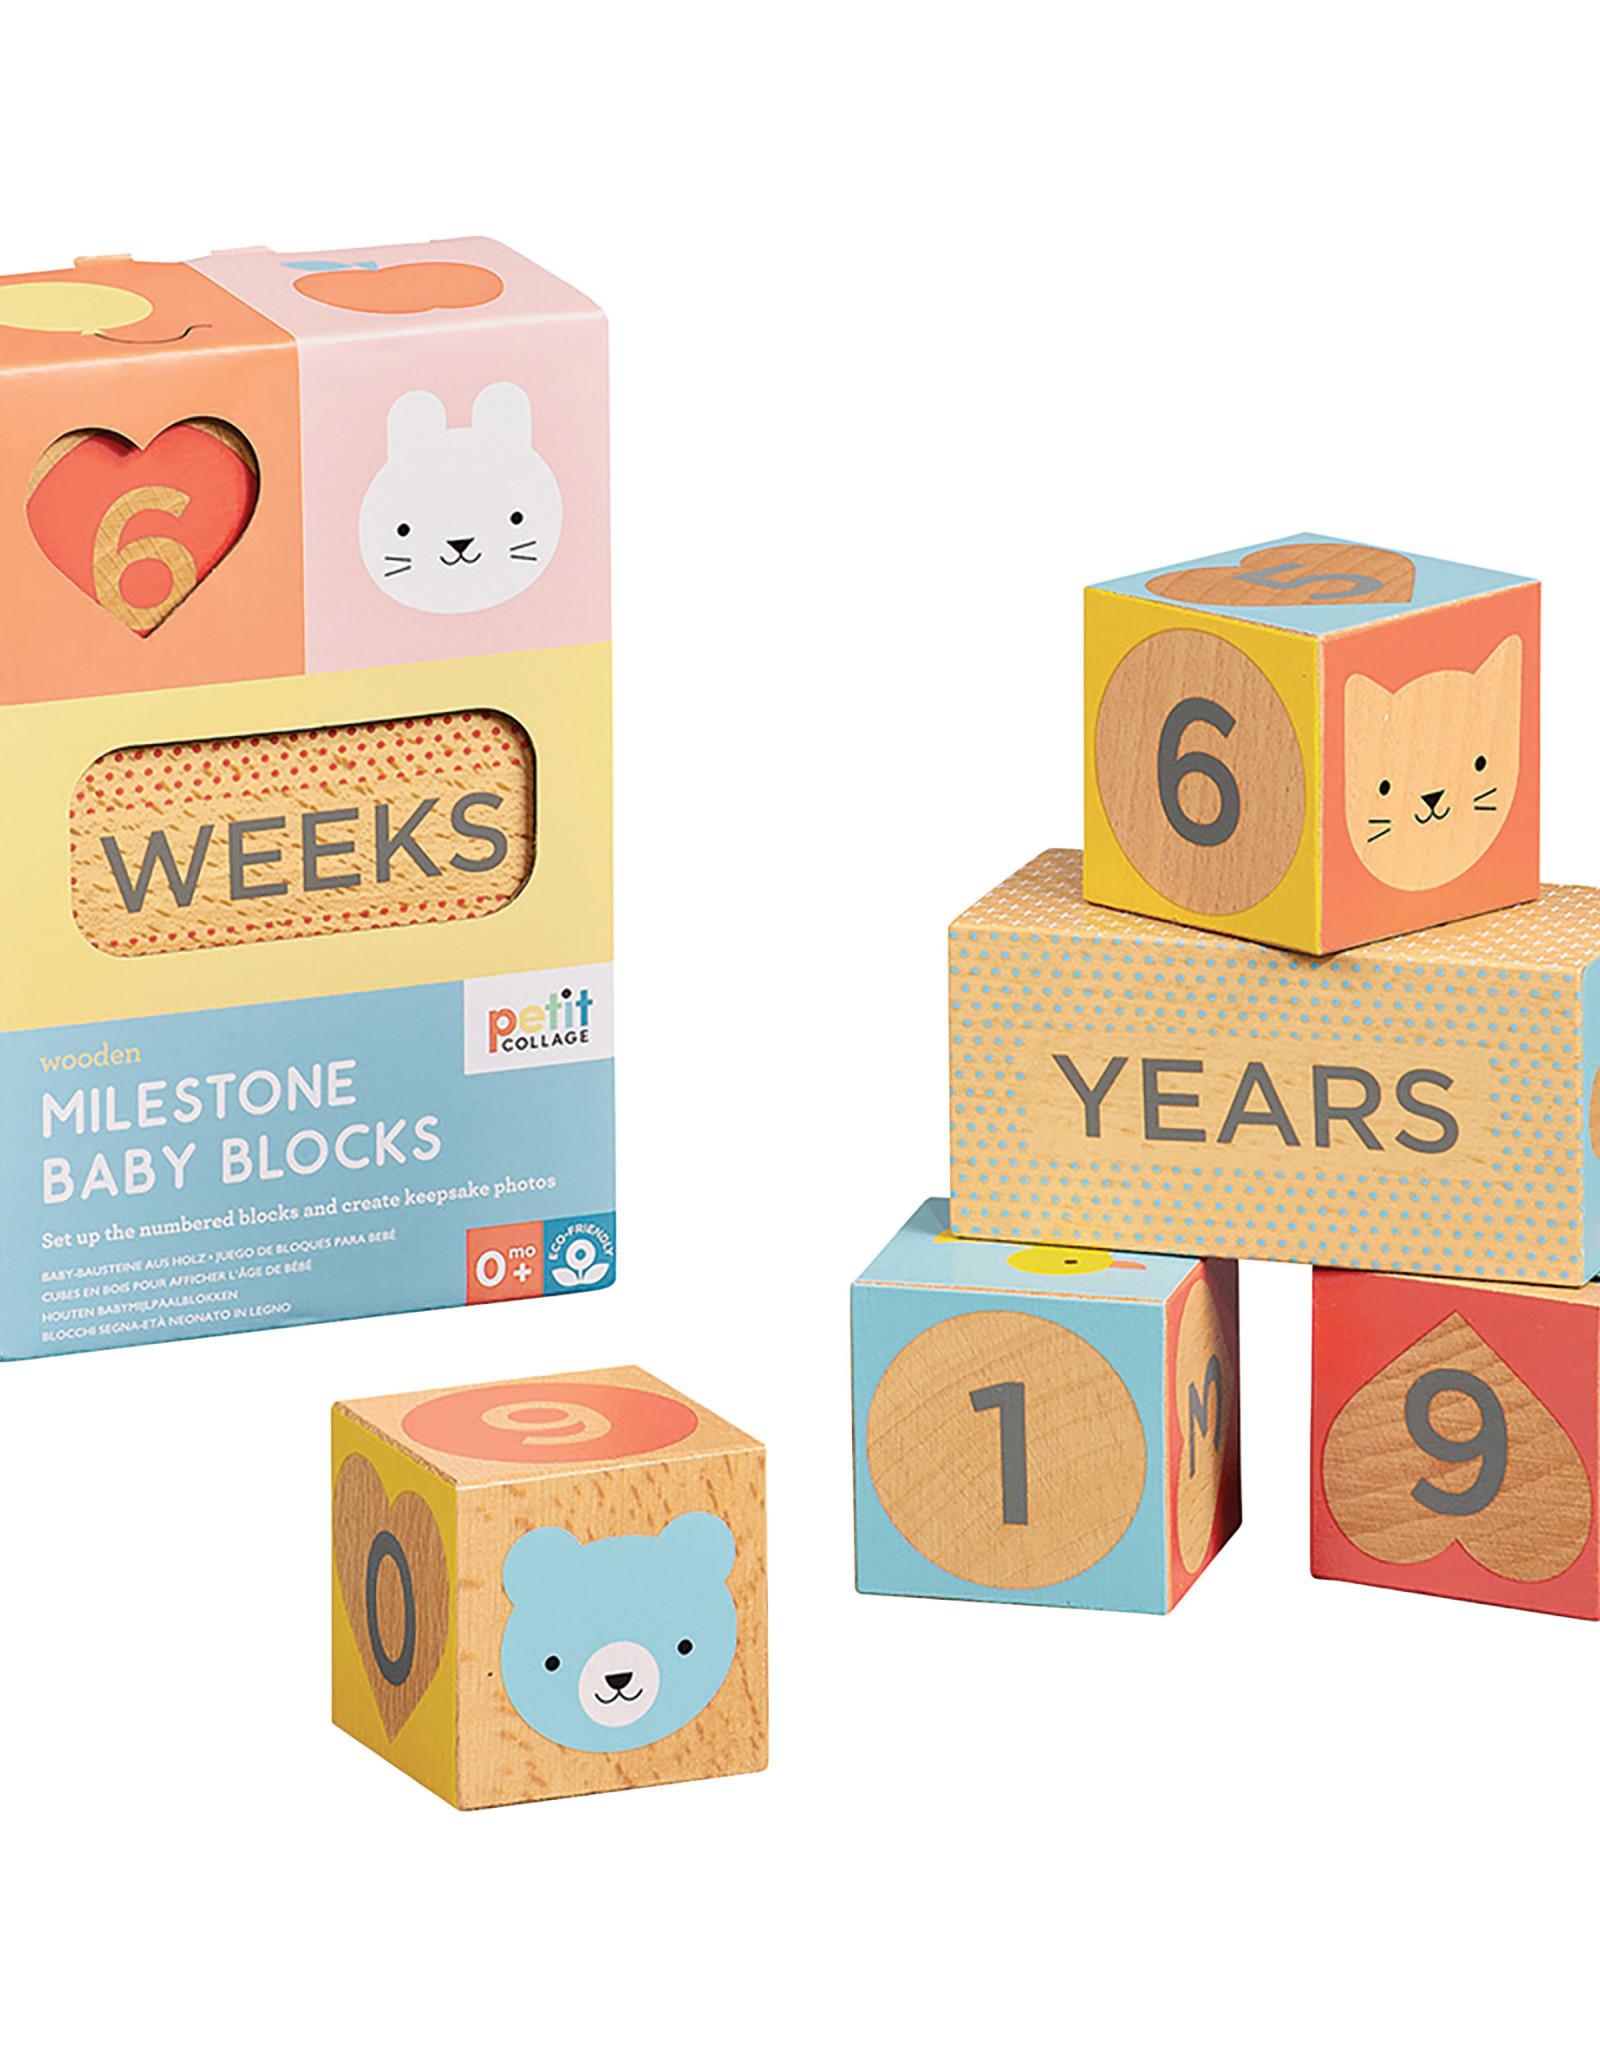 INDEPENDENCE STUDIOS PTC468 Milestone Baby Blocks